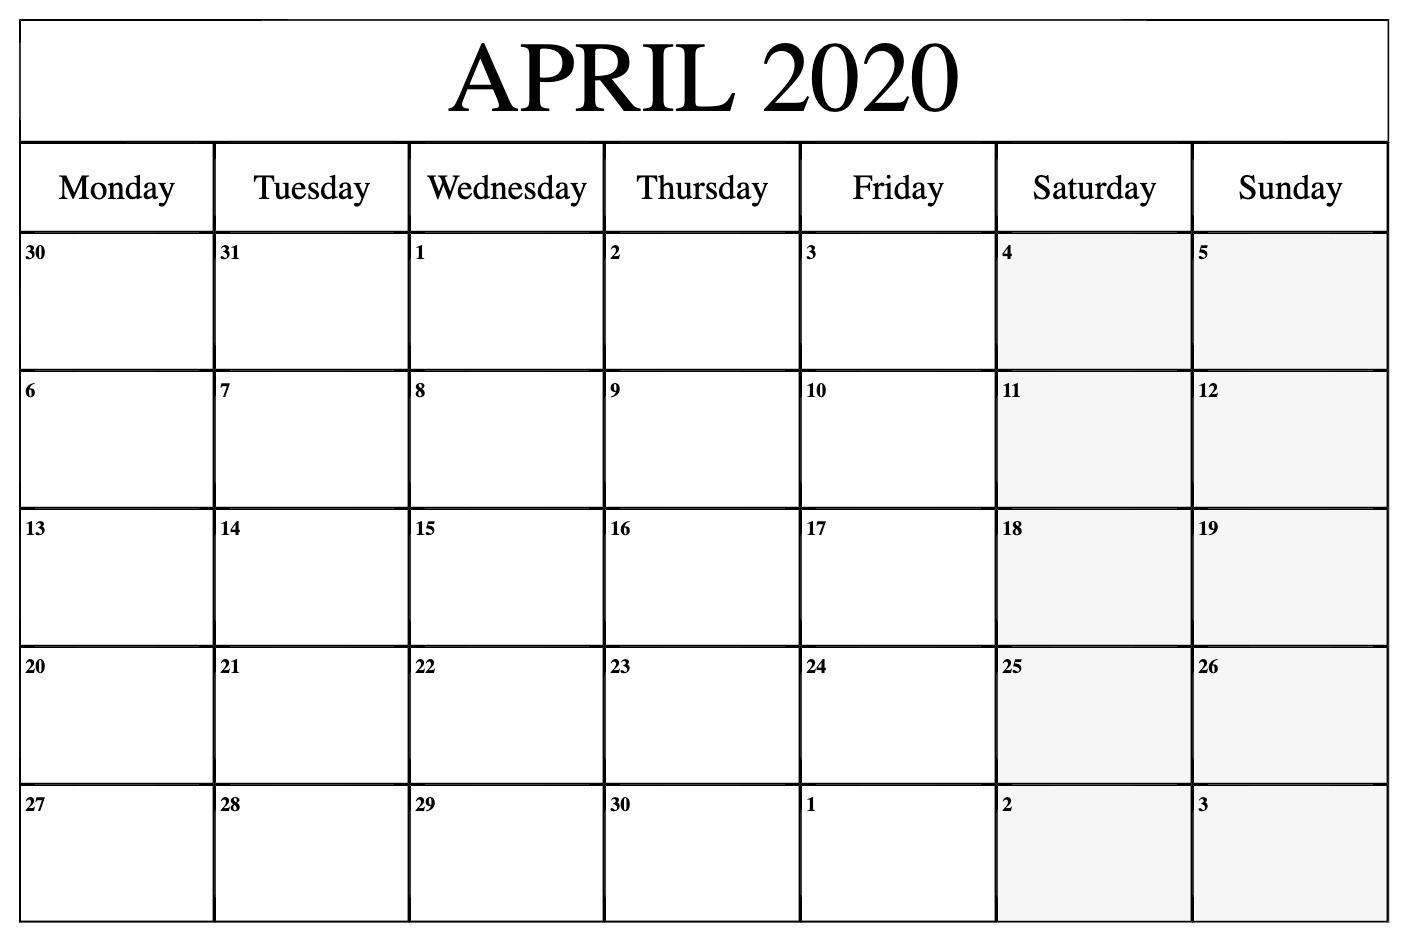 Free Printable April 2020 Calendar Template Pdf, Word, Excel